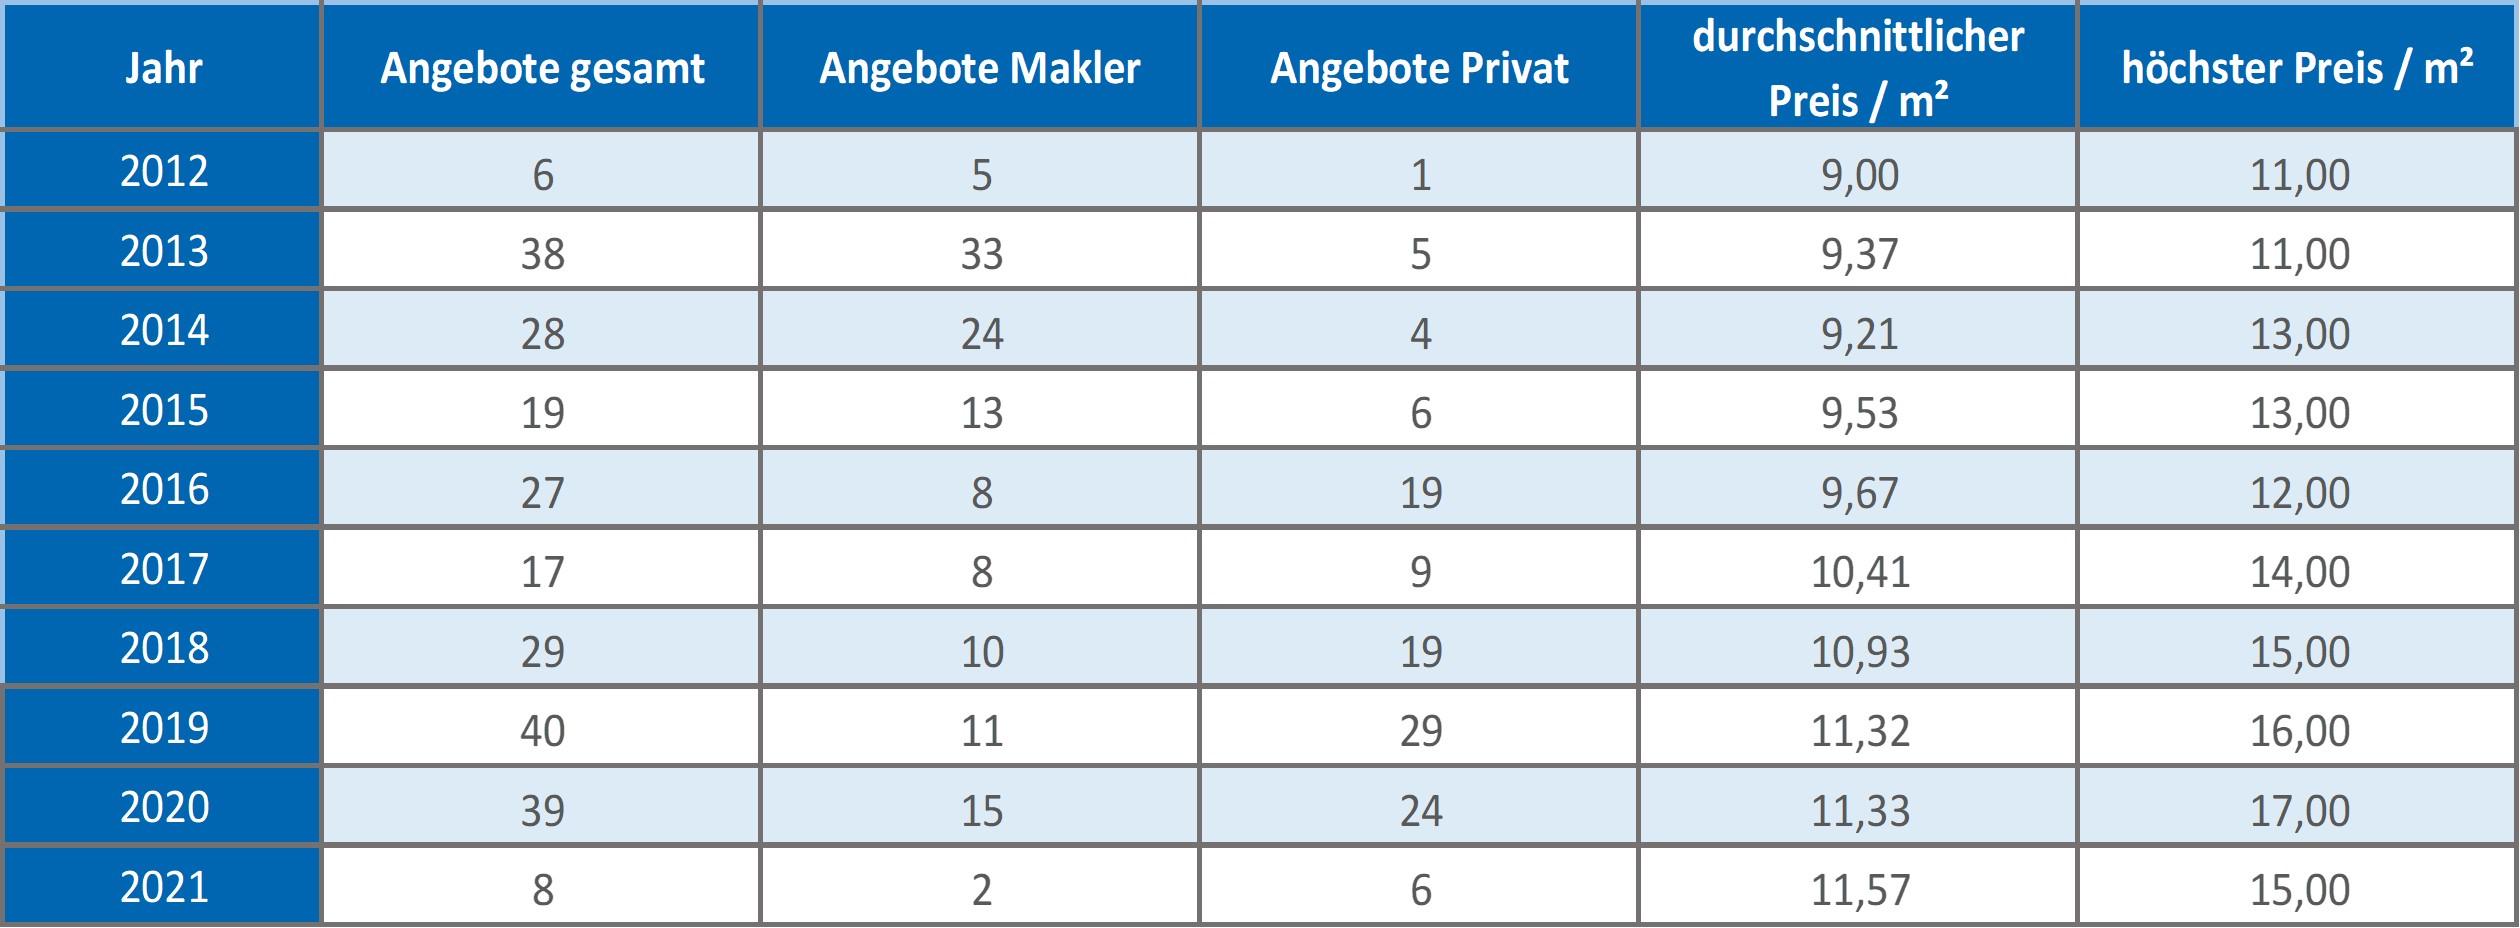 Bad Aibling Makler Wohnung mieten vermieten Preis Bewertung 2019, 2020, 2021